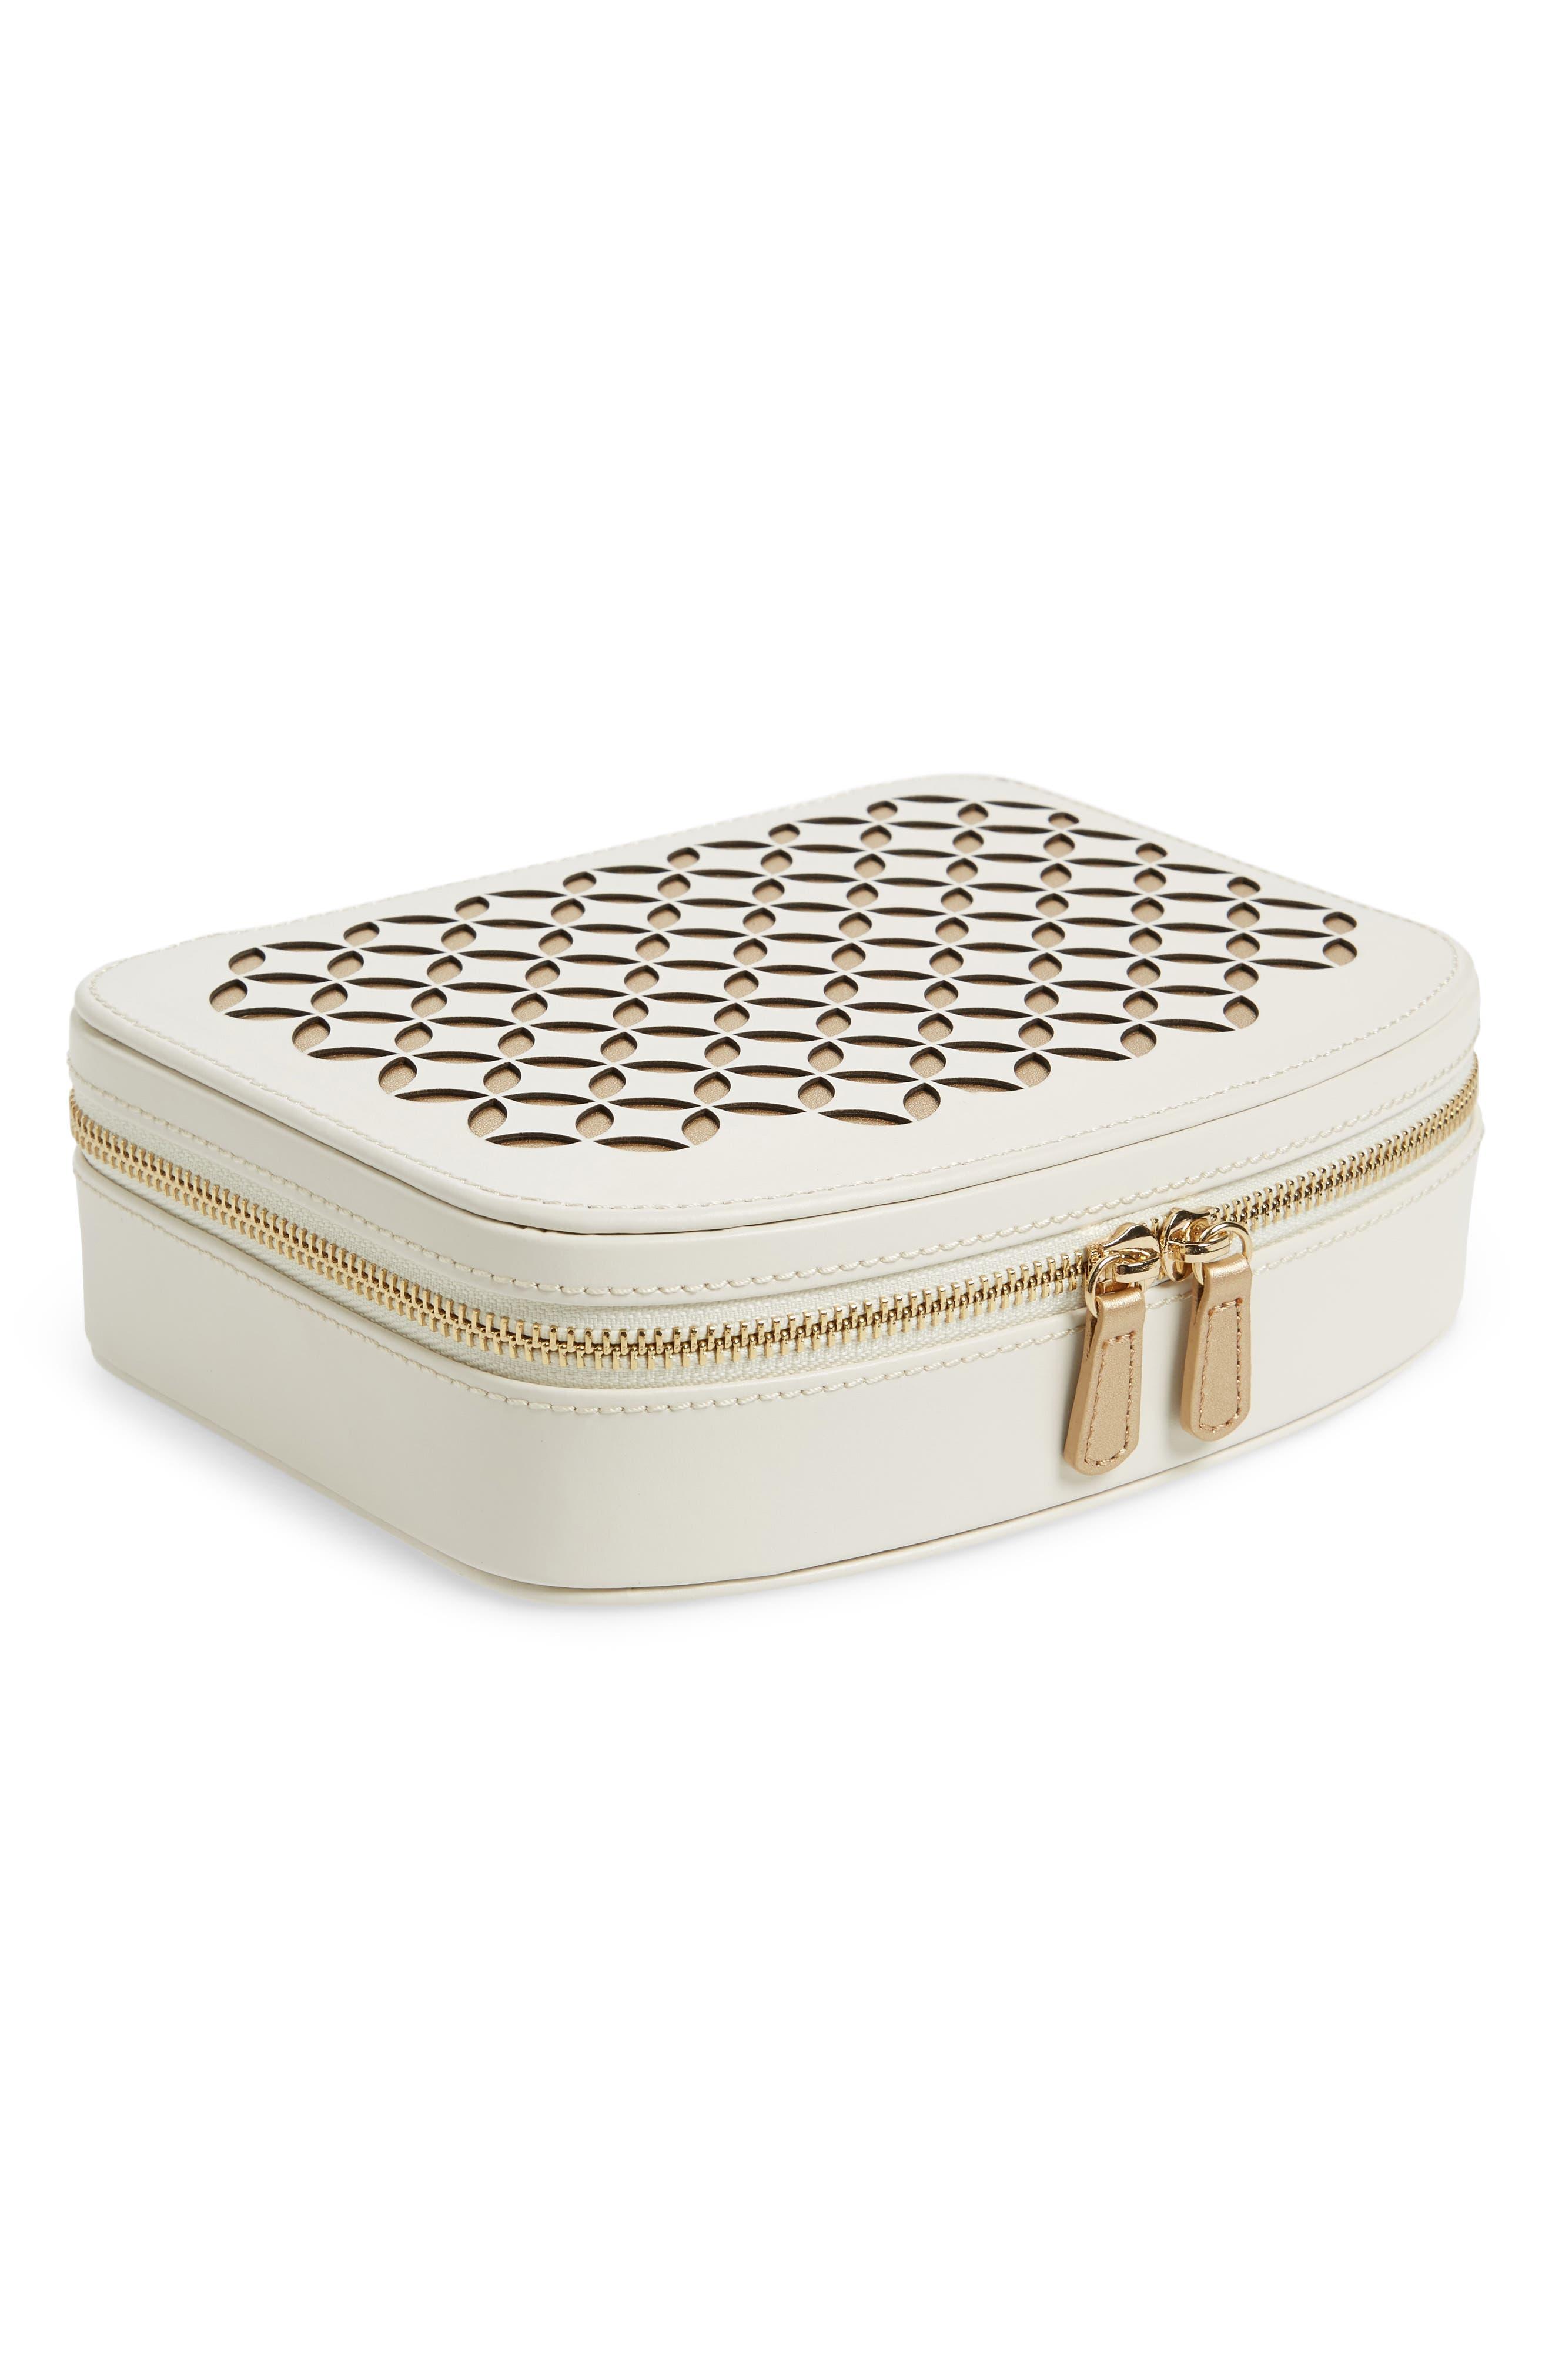 Chloe Zip Jewelry Case,                         Main,                         color, Cream